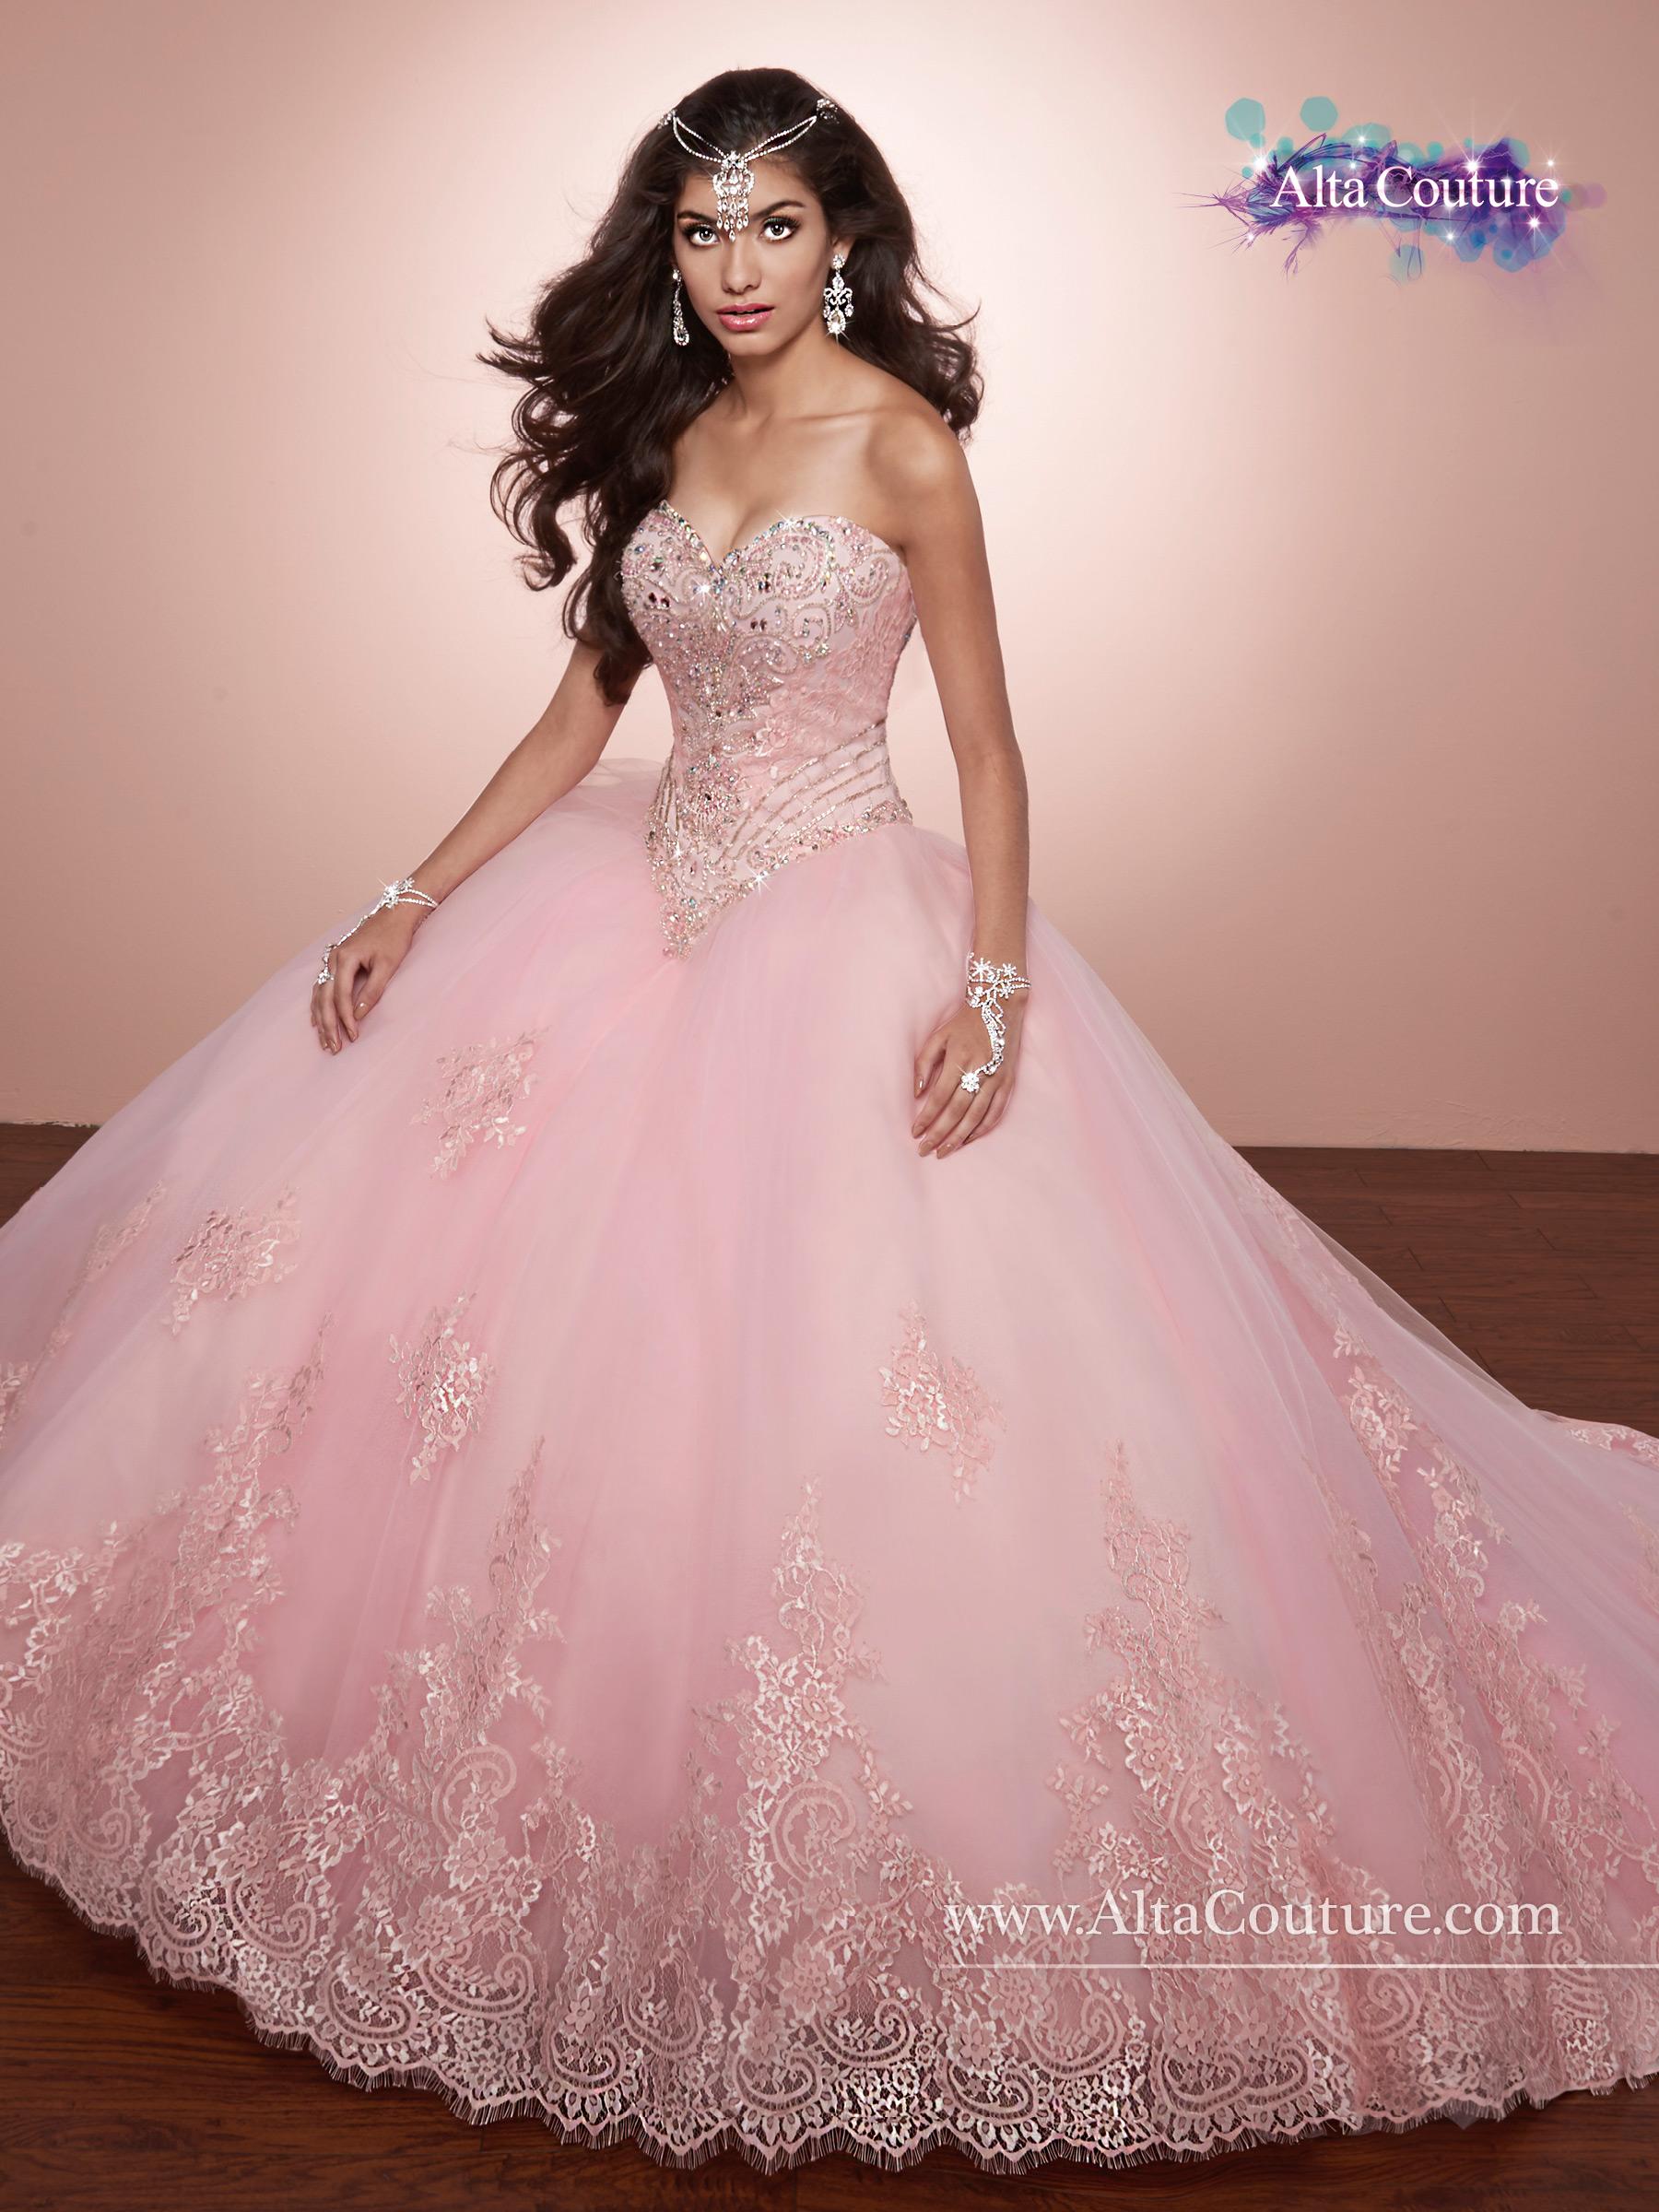 62abe87e078 Quinceanera Couture Dresses